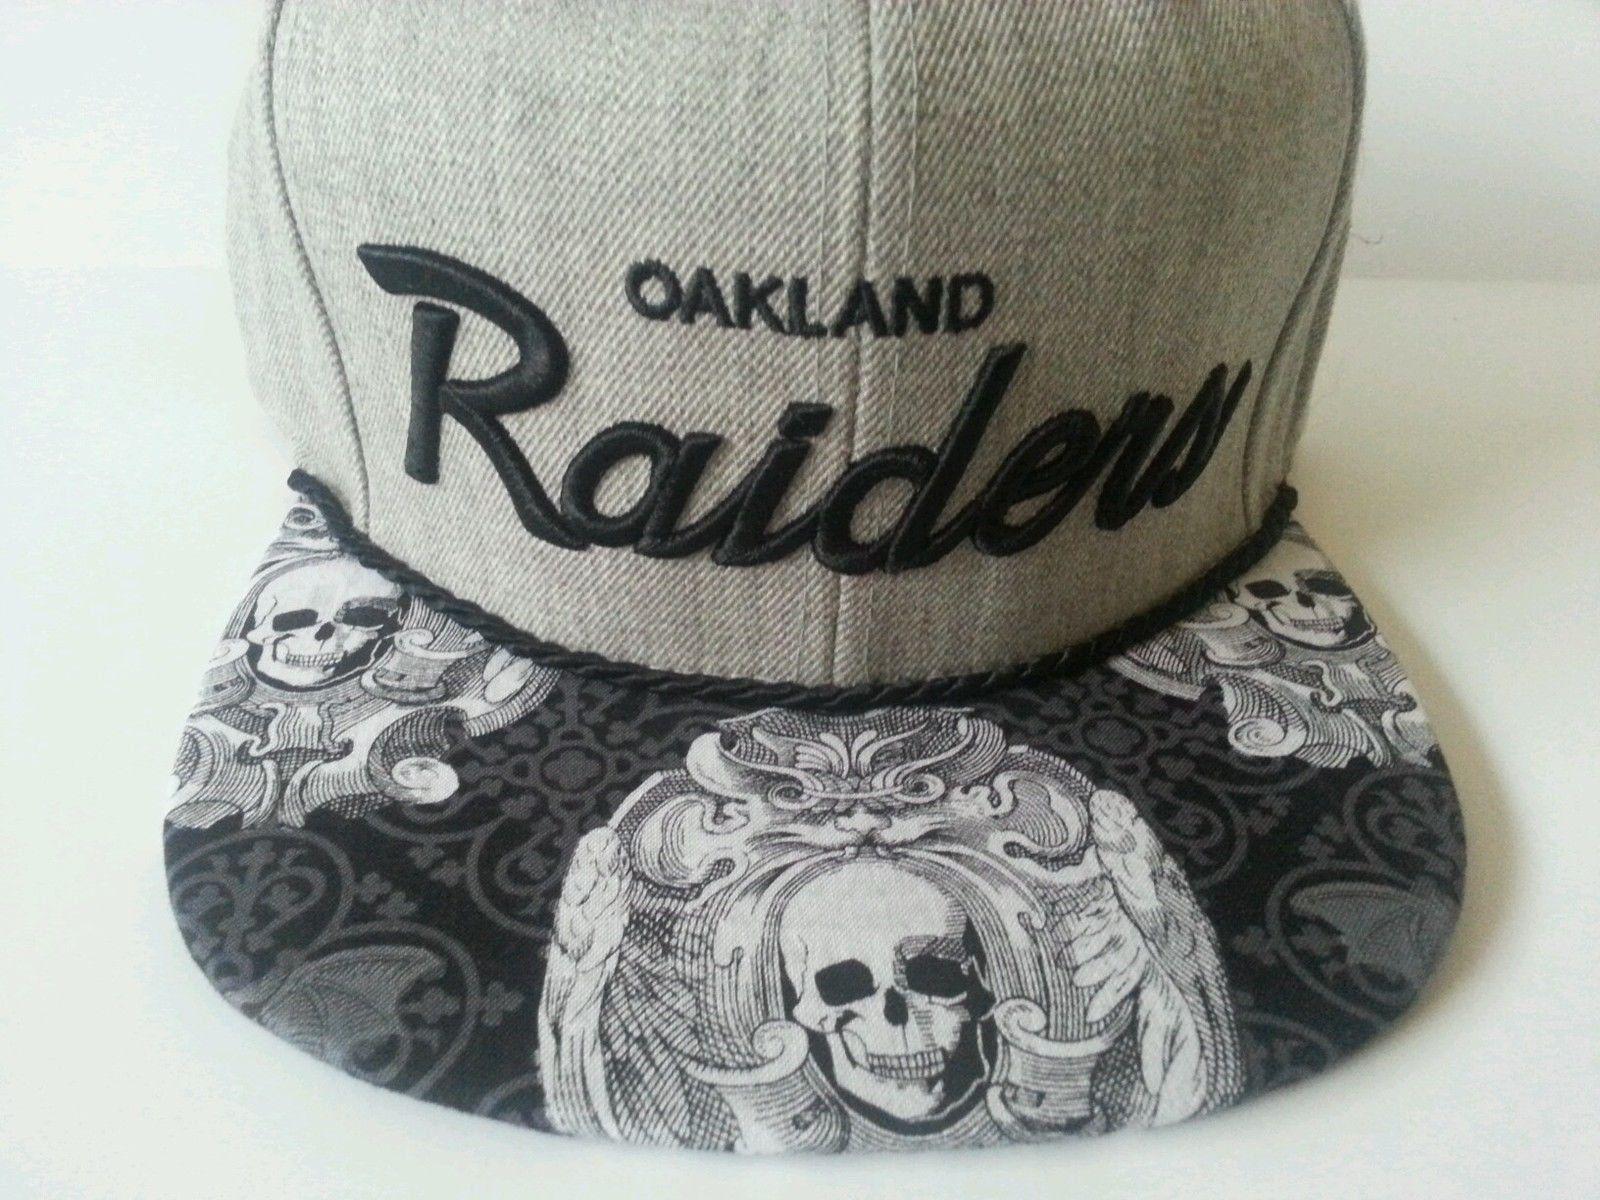 2a3ec54af1336 Mitchell and Ness NFL Oakland Raiders Custom Snapback Cap